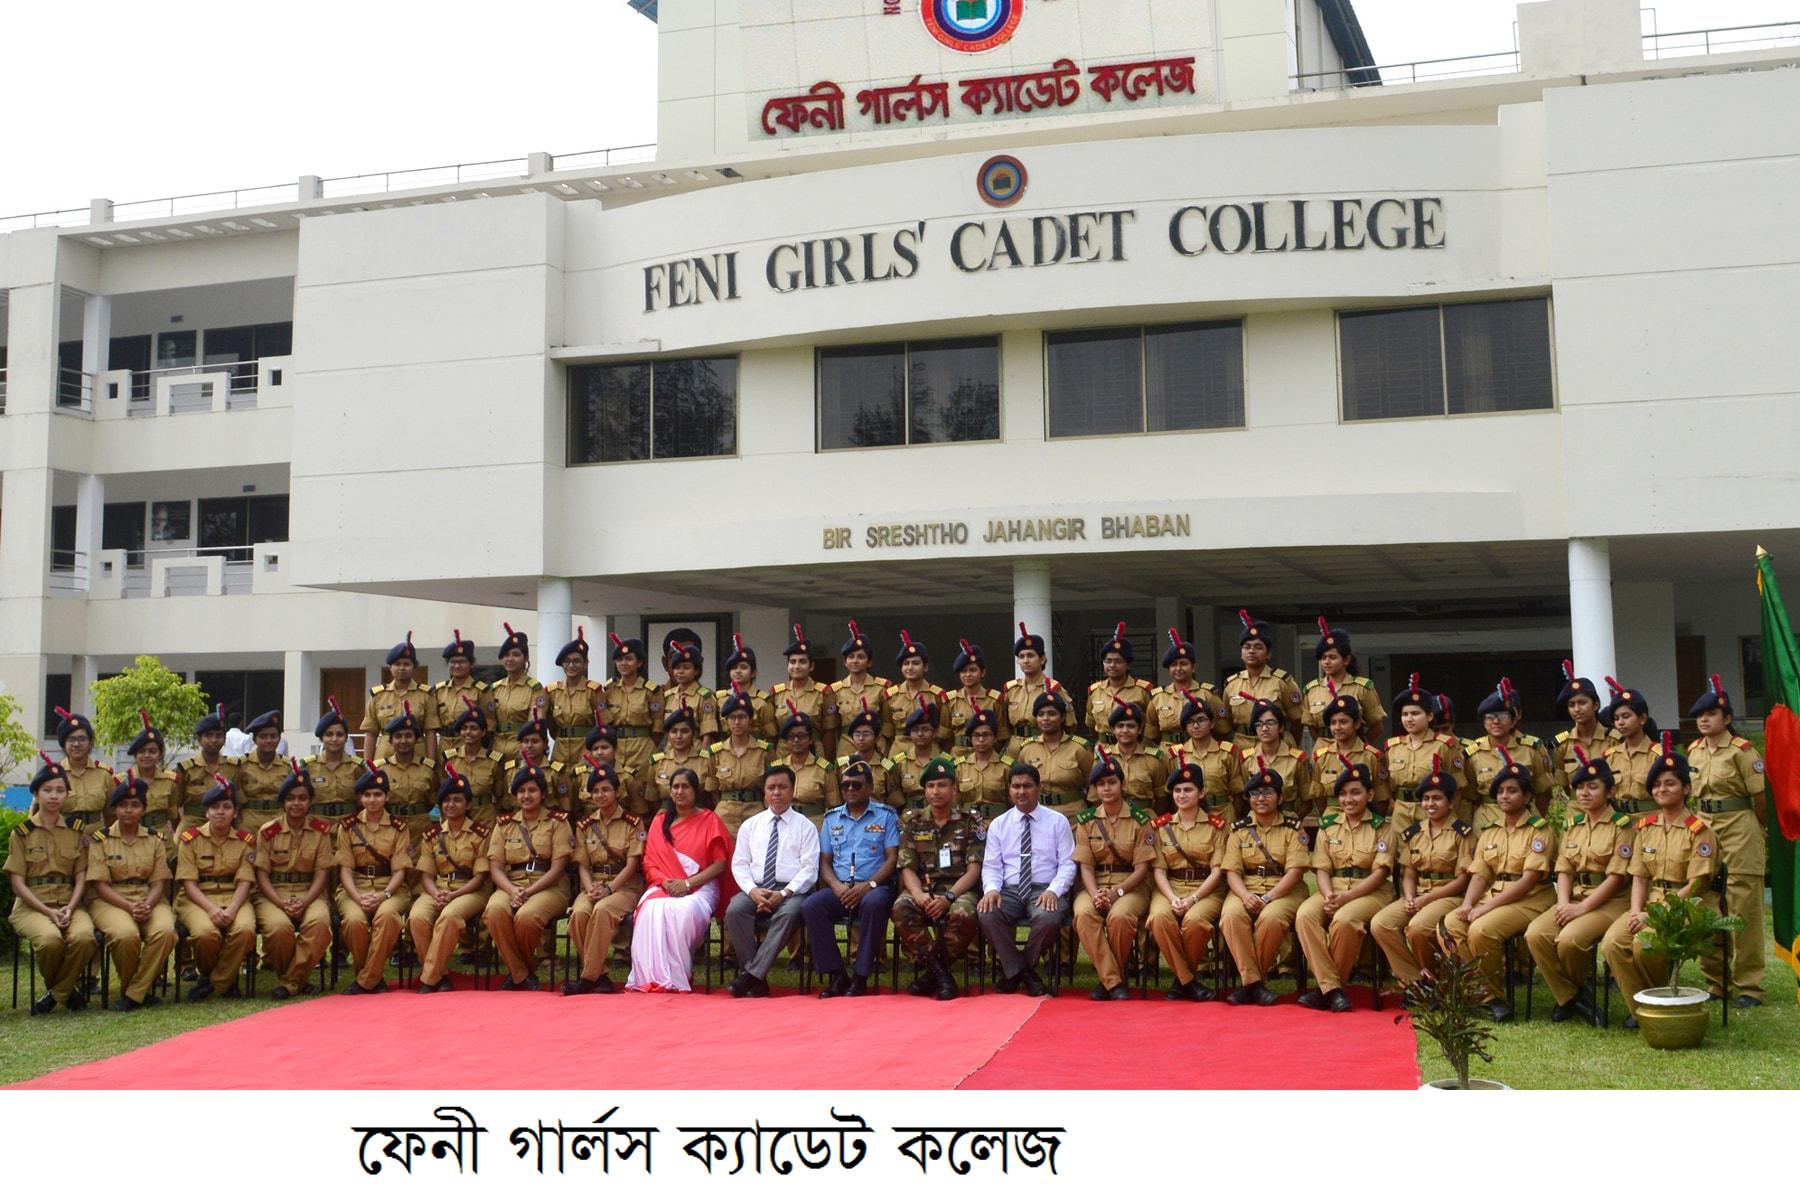 Feni Girls Cadet College-min